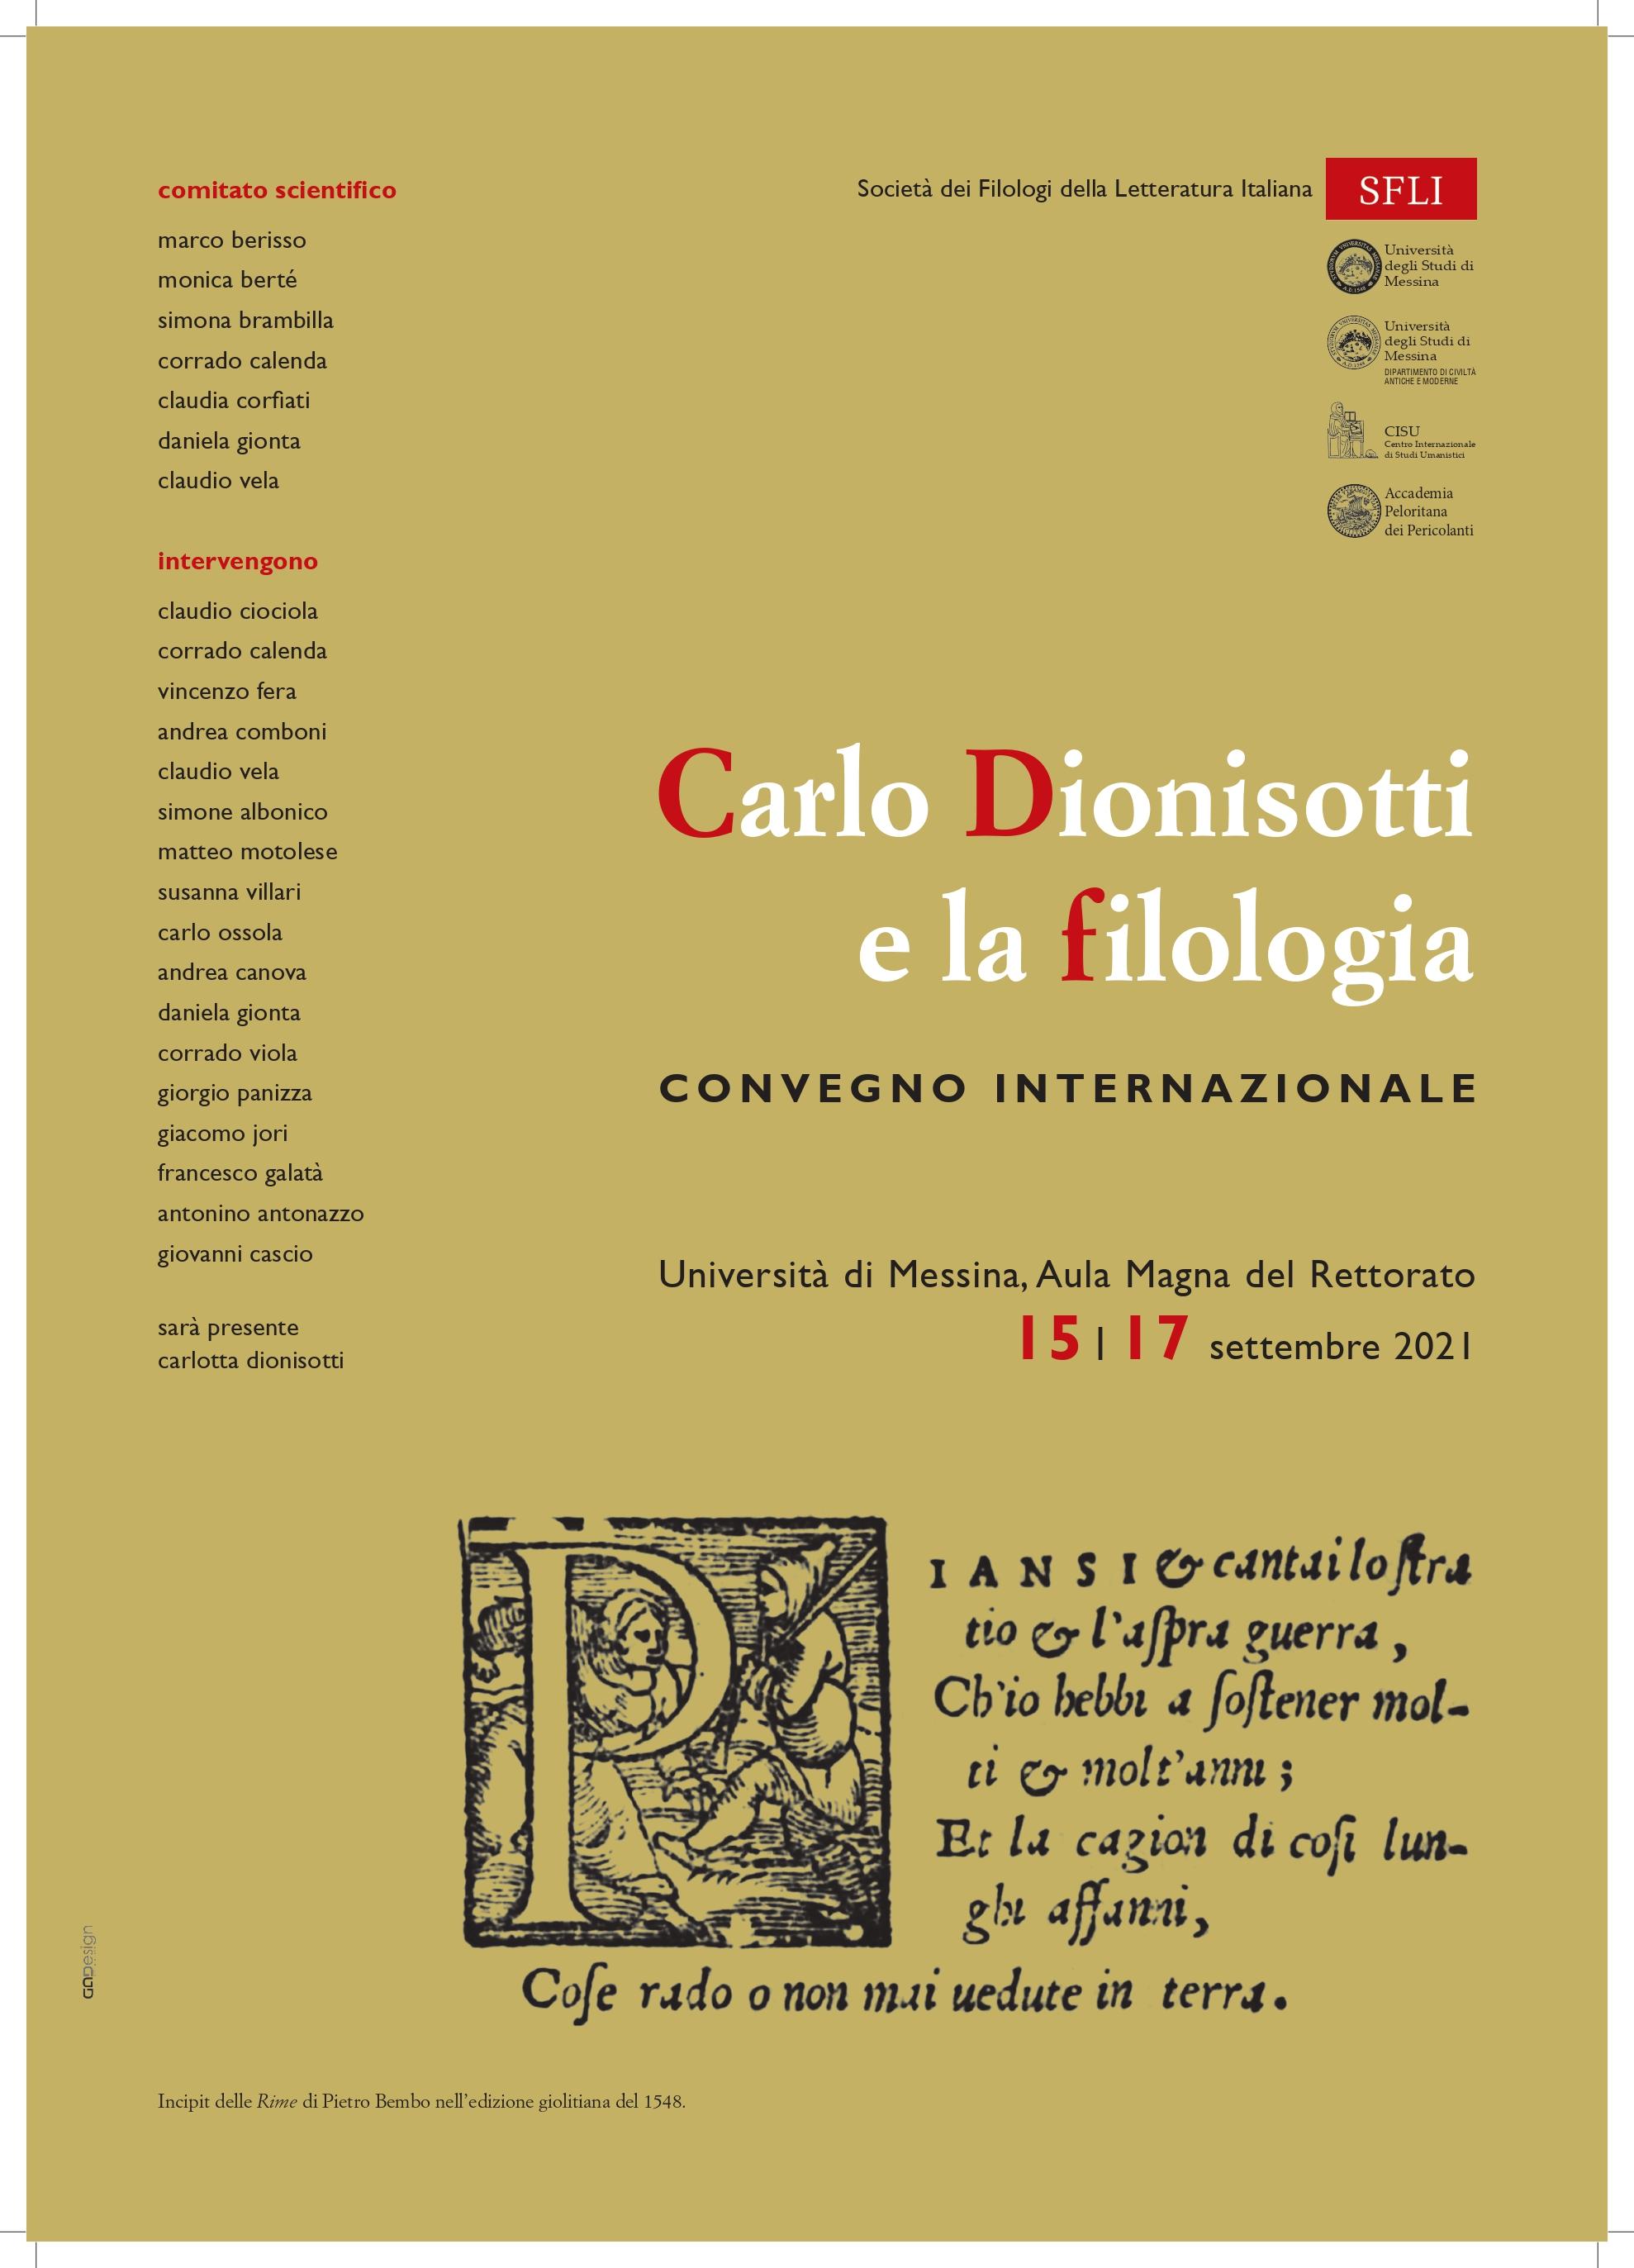 locandina 32x45_page-0001